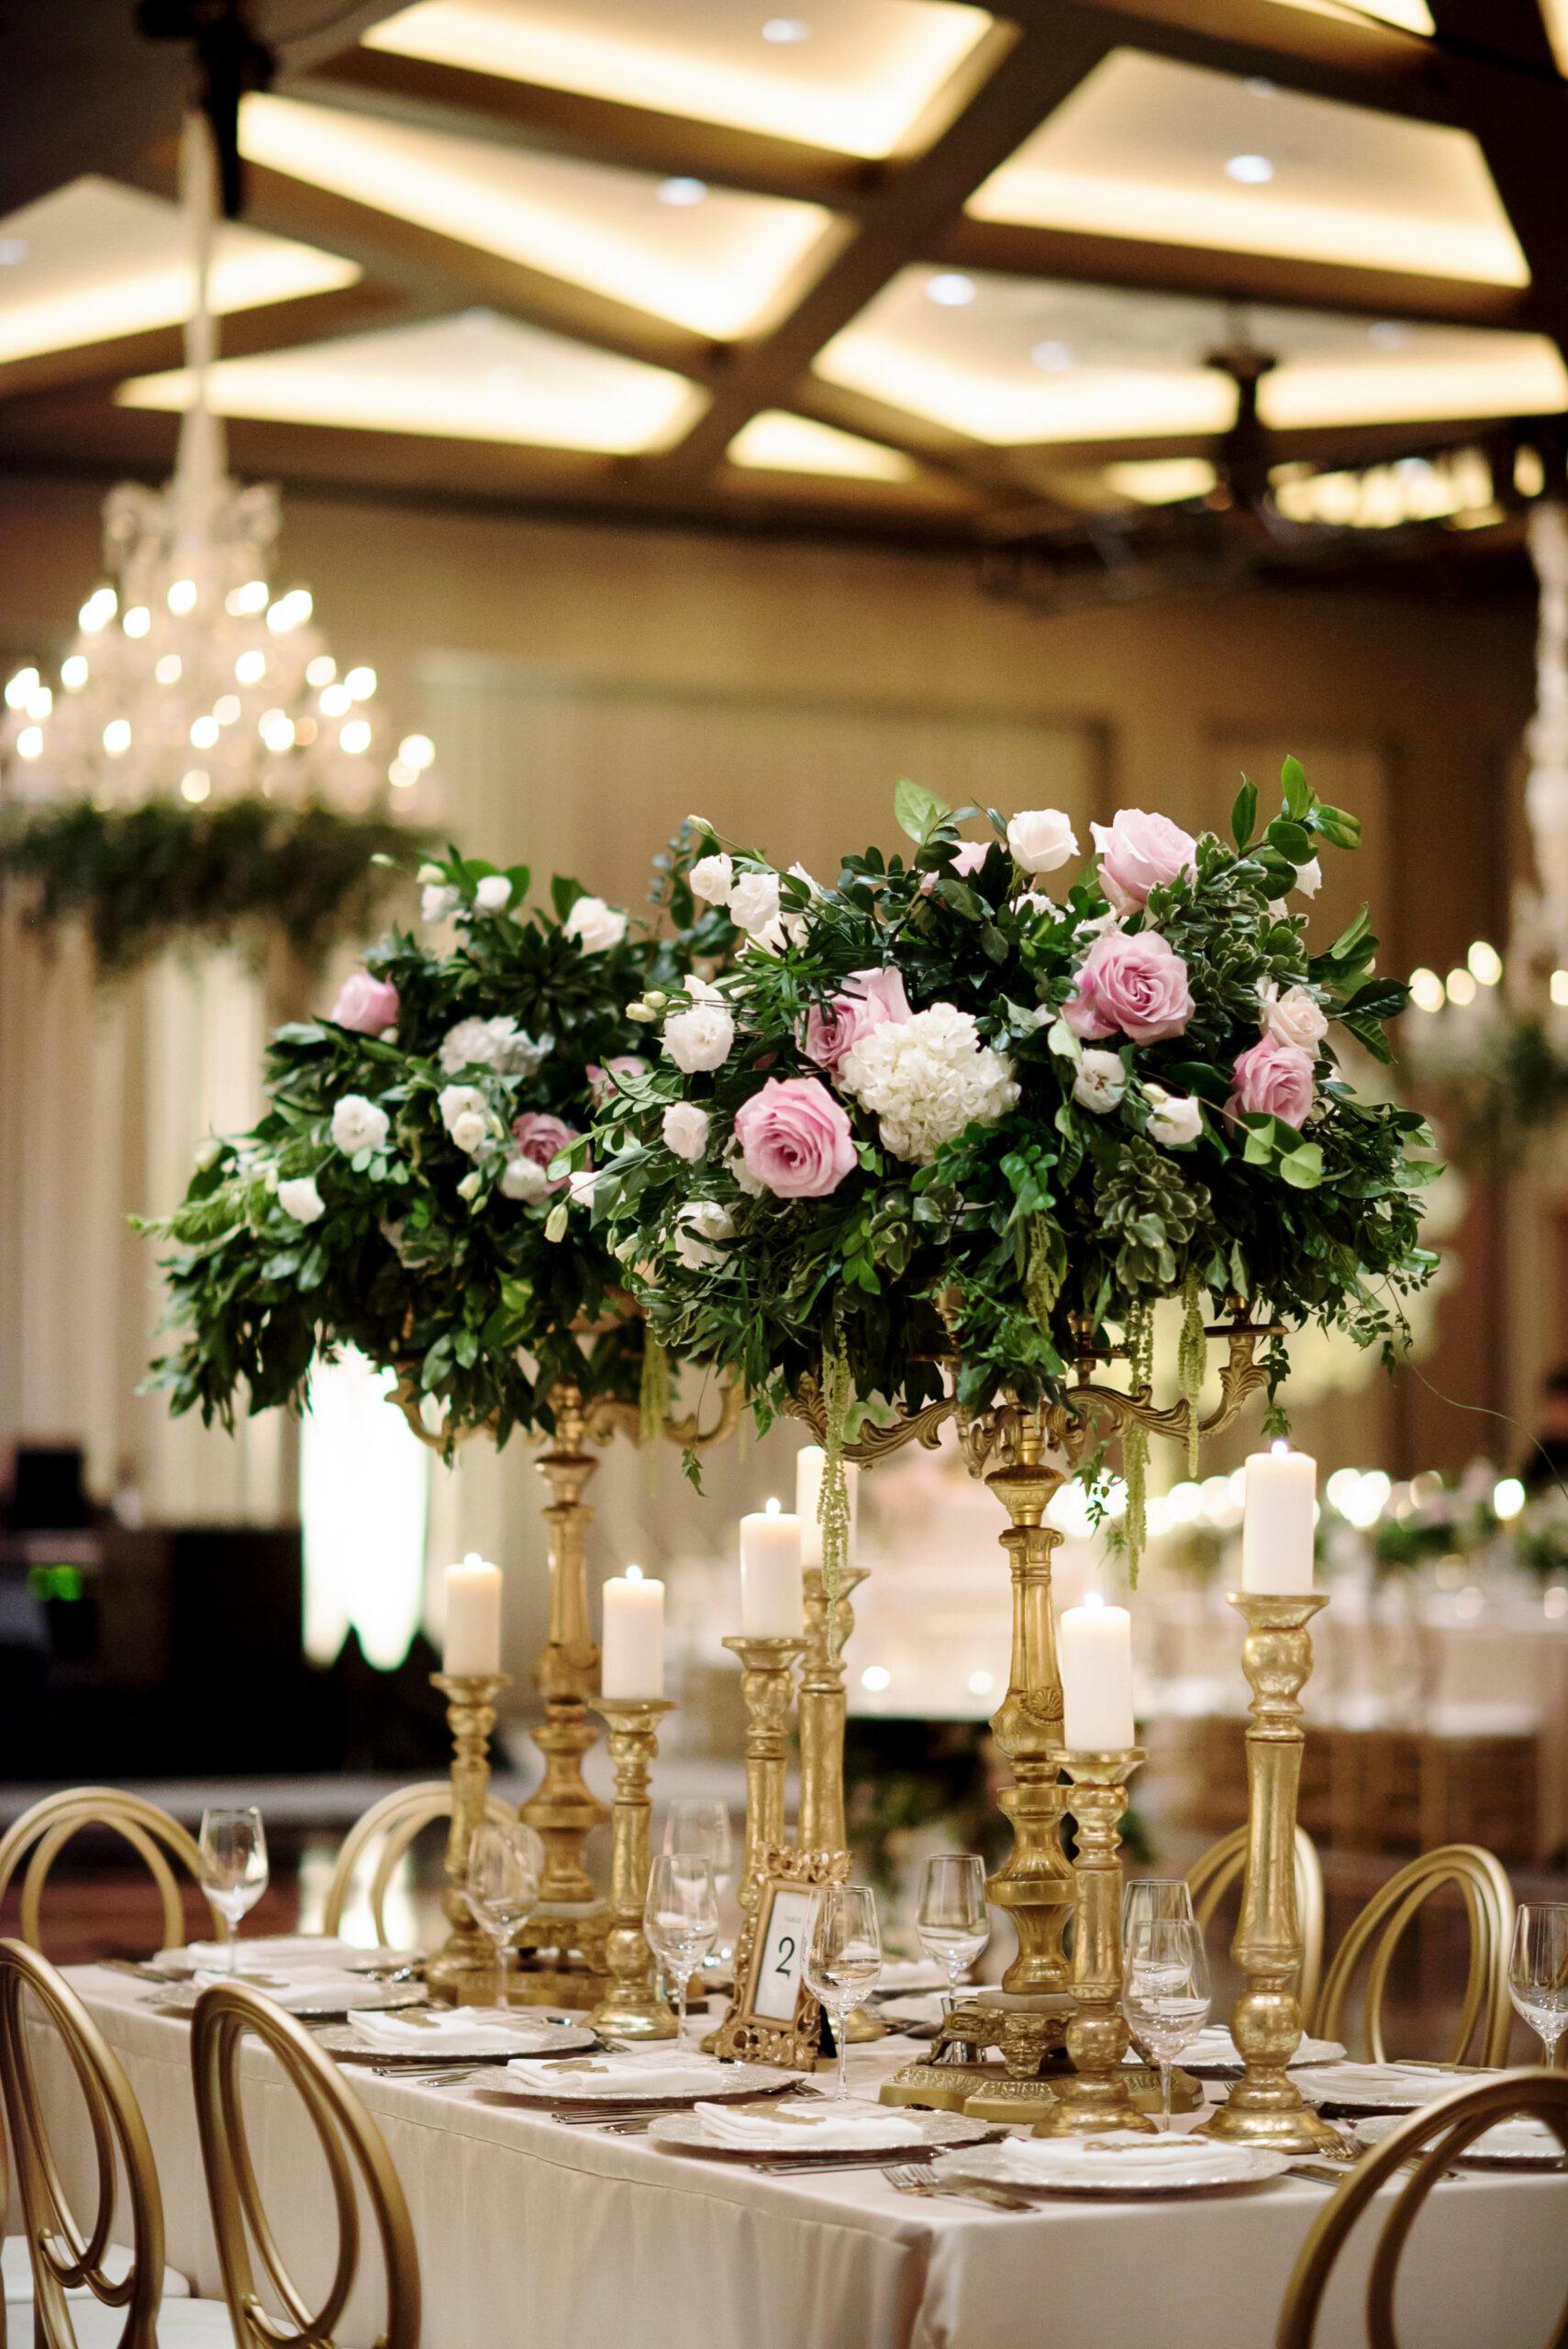 https://secureservercdn.net/45.40.145.151/kgq.ab5.myftpupload.com/wp-content/uploads/2020/04/Sanam-Soroush-s-Wedding-wedluxe-submission-0084-scaled.jpg?time=1627956768